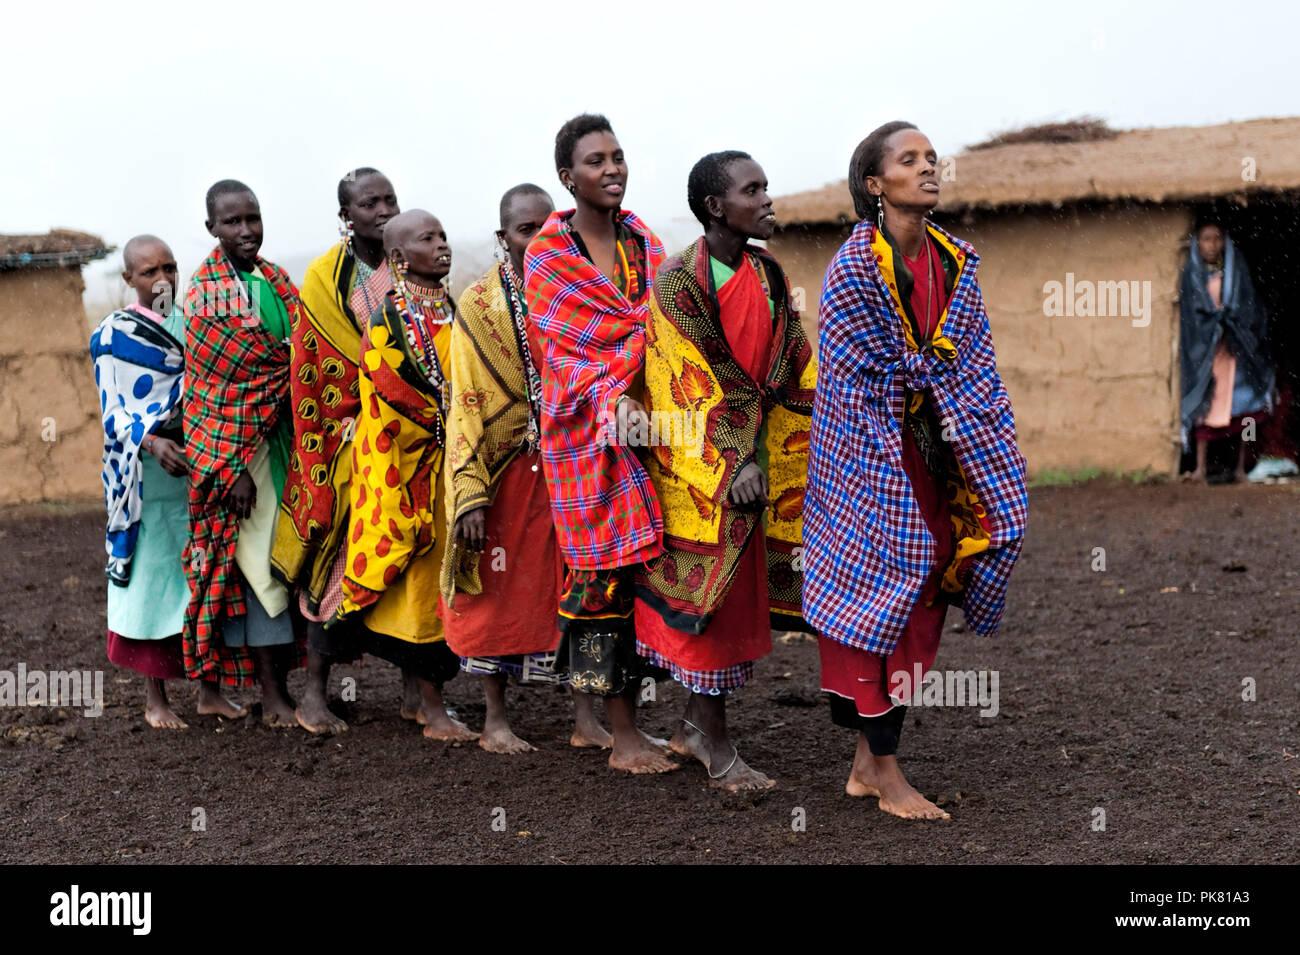 Group of Masai Ladies wearing traditional clothing  preparing to do a local dance Masai Mara Kenya East Africa - Stock Image